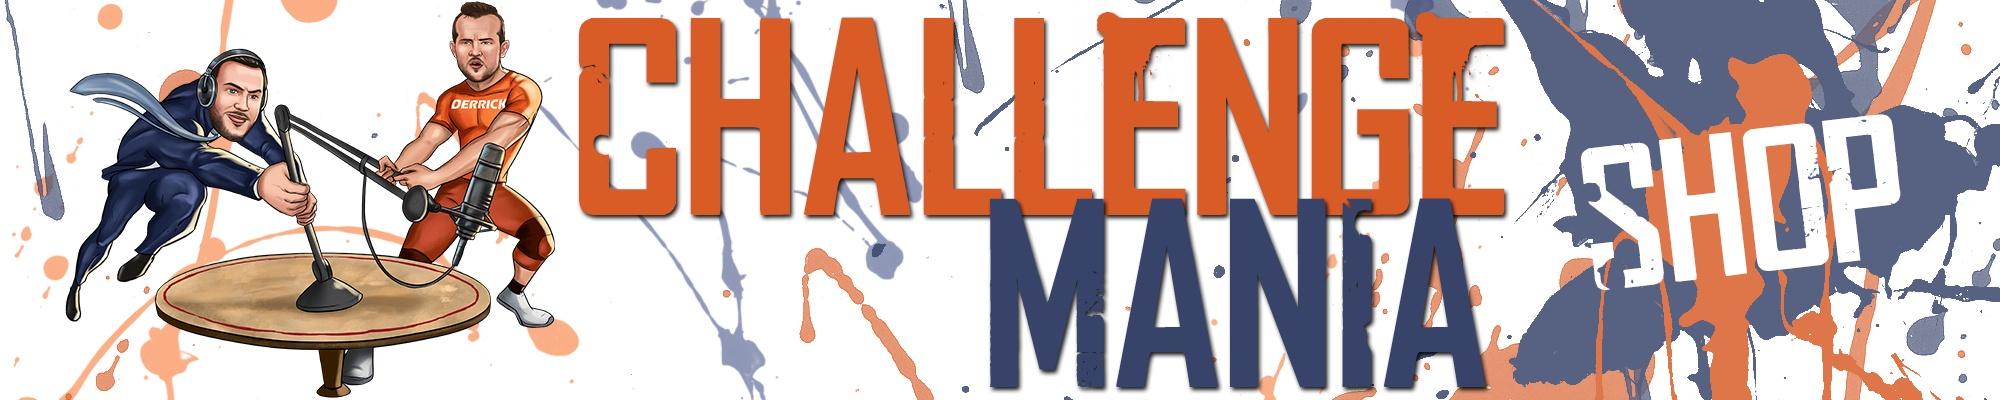 ChallengeMania Cover